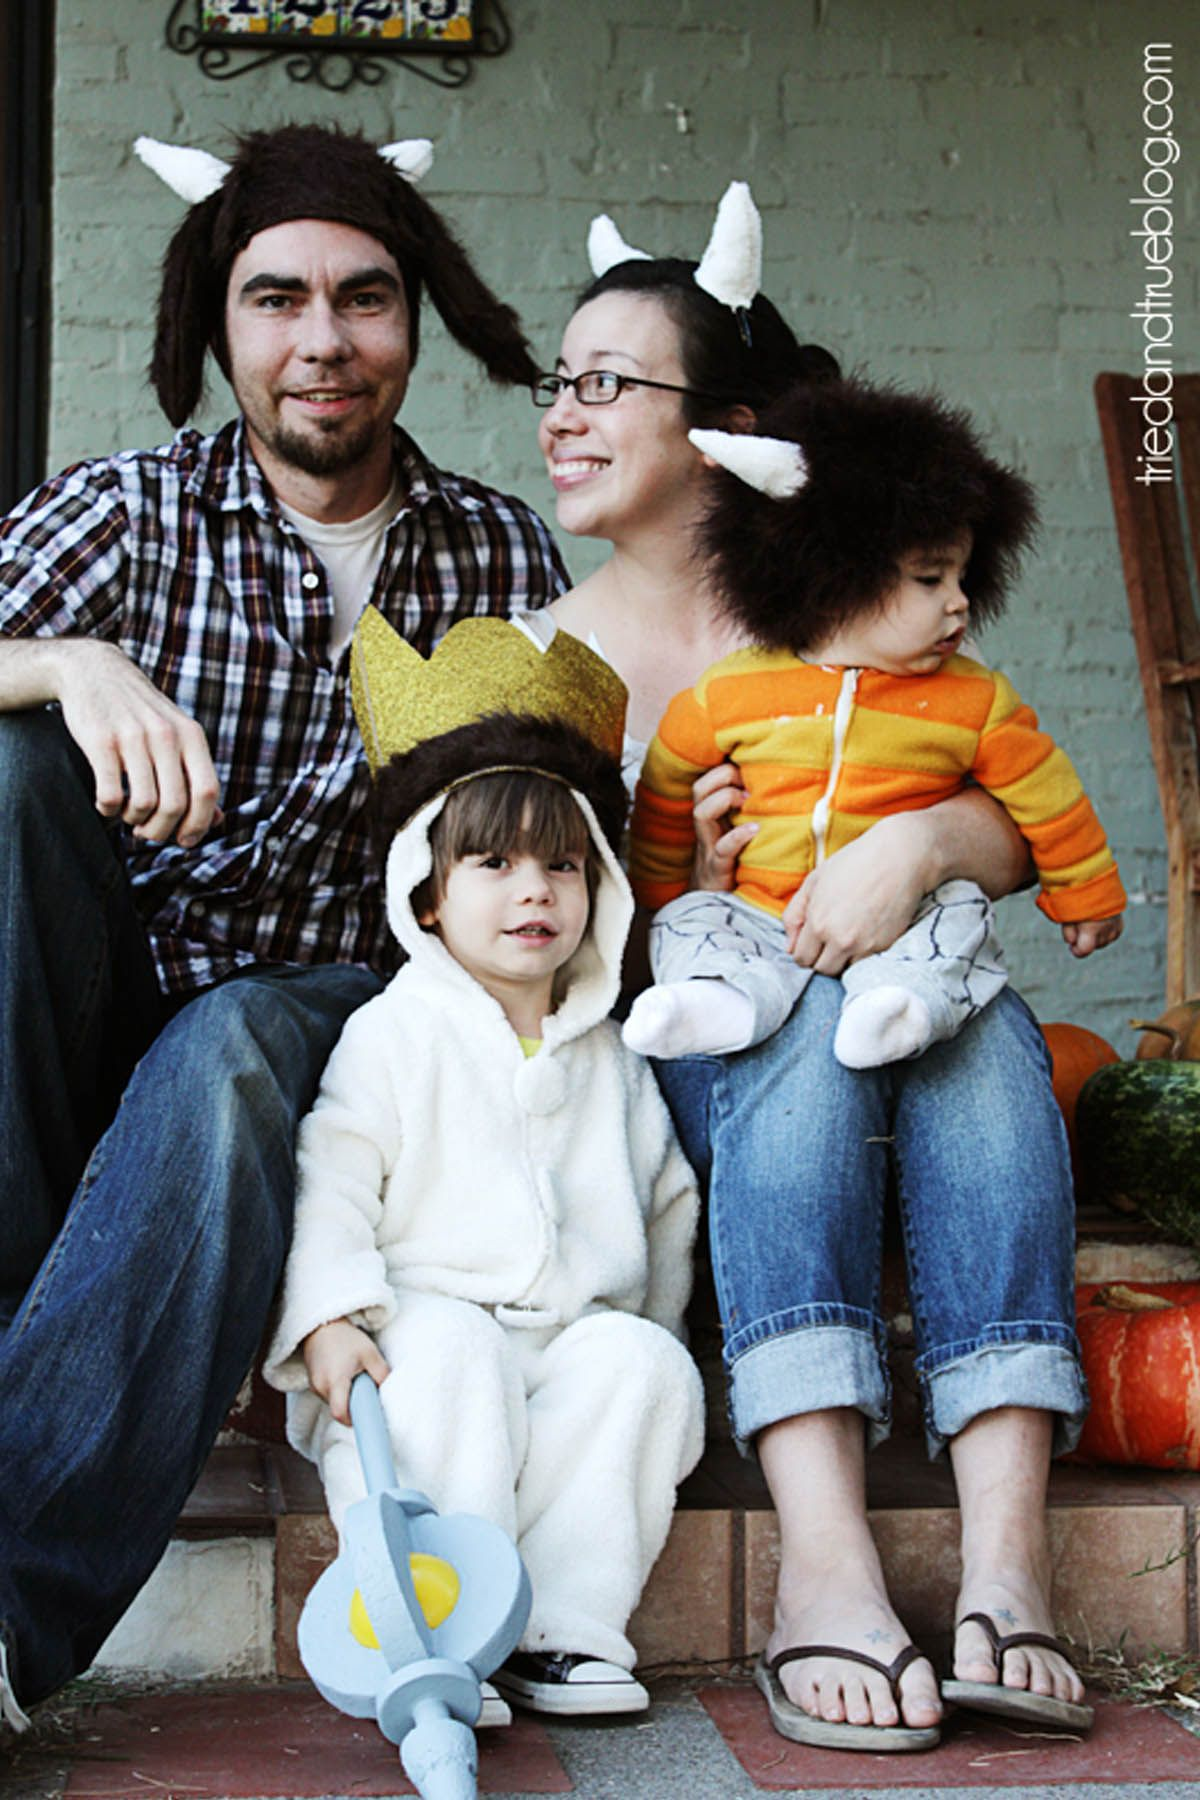 Halloween Costumes For 3 Kids.57 Family Halloween Costumes Addams Family Flintstones